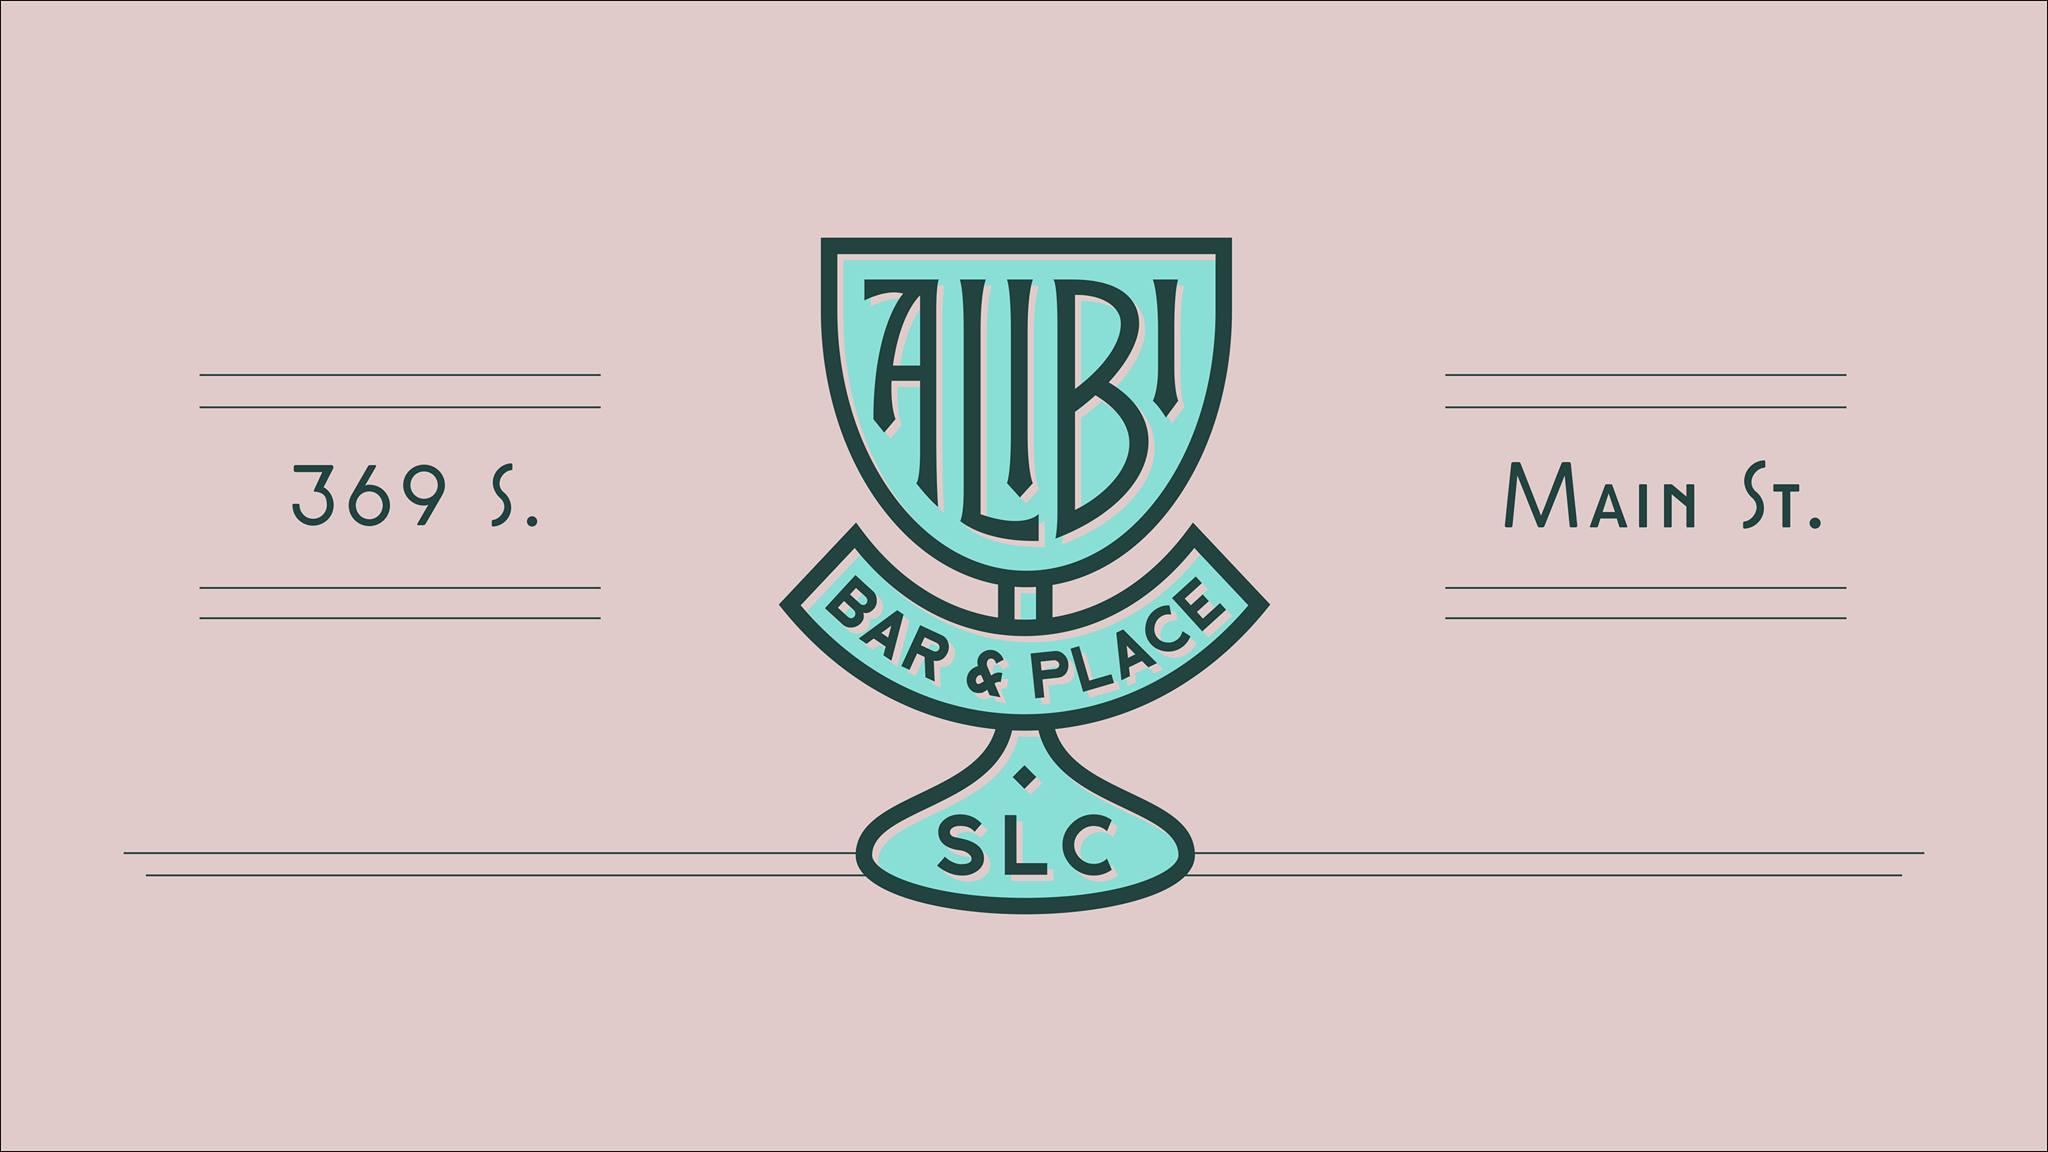 alibi slc